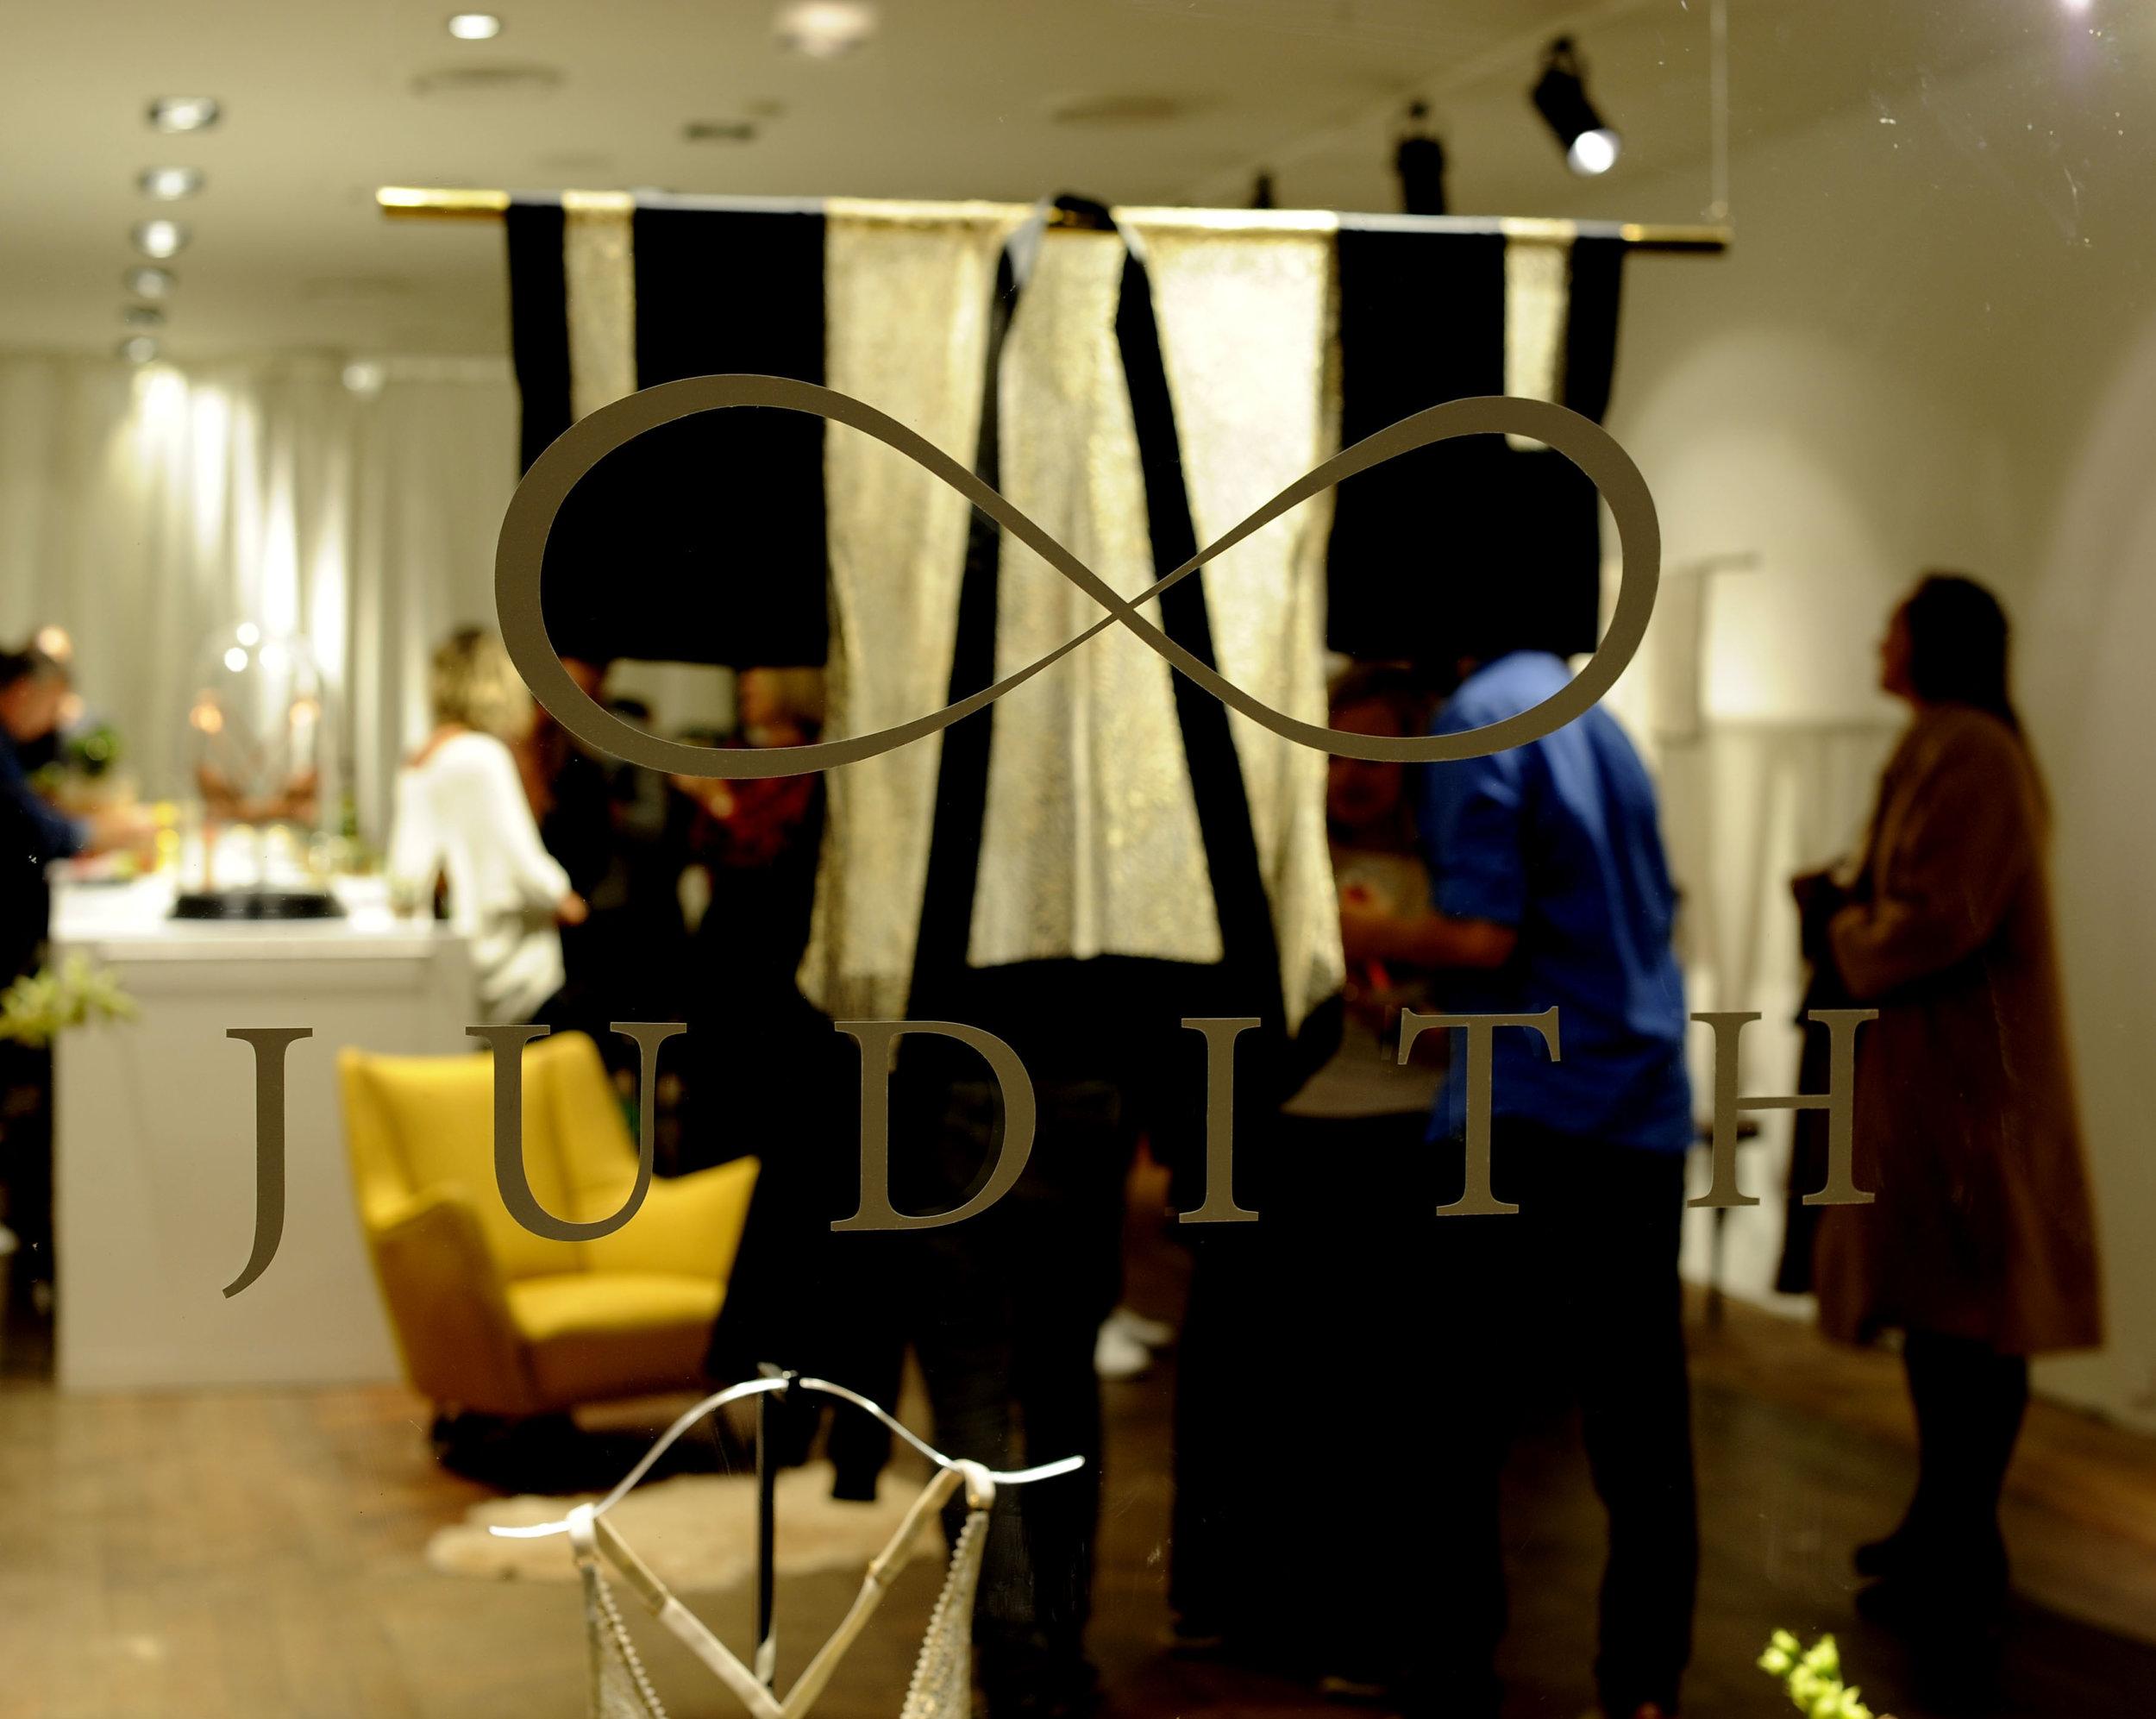 JUDITH Lingerie Hopland shop logo.JPG